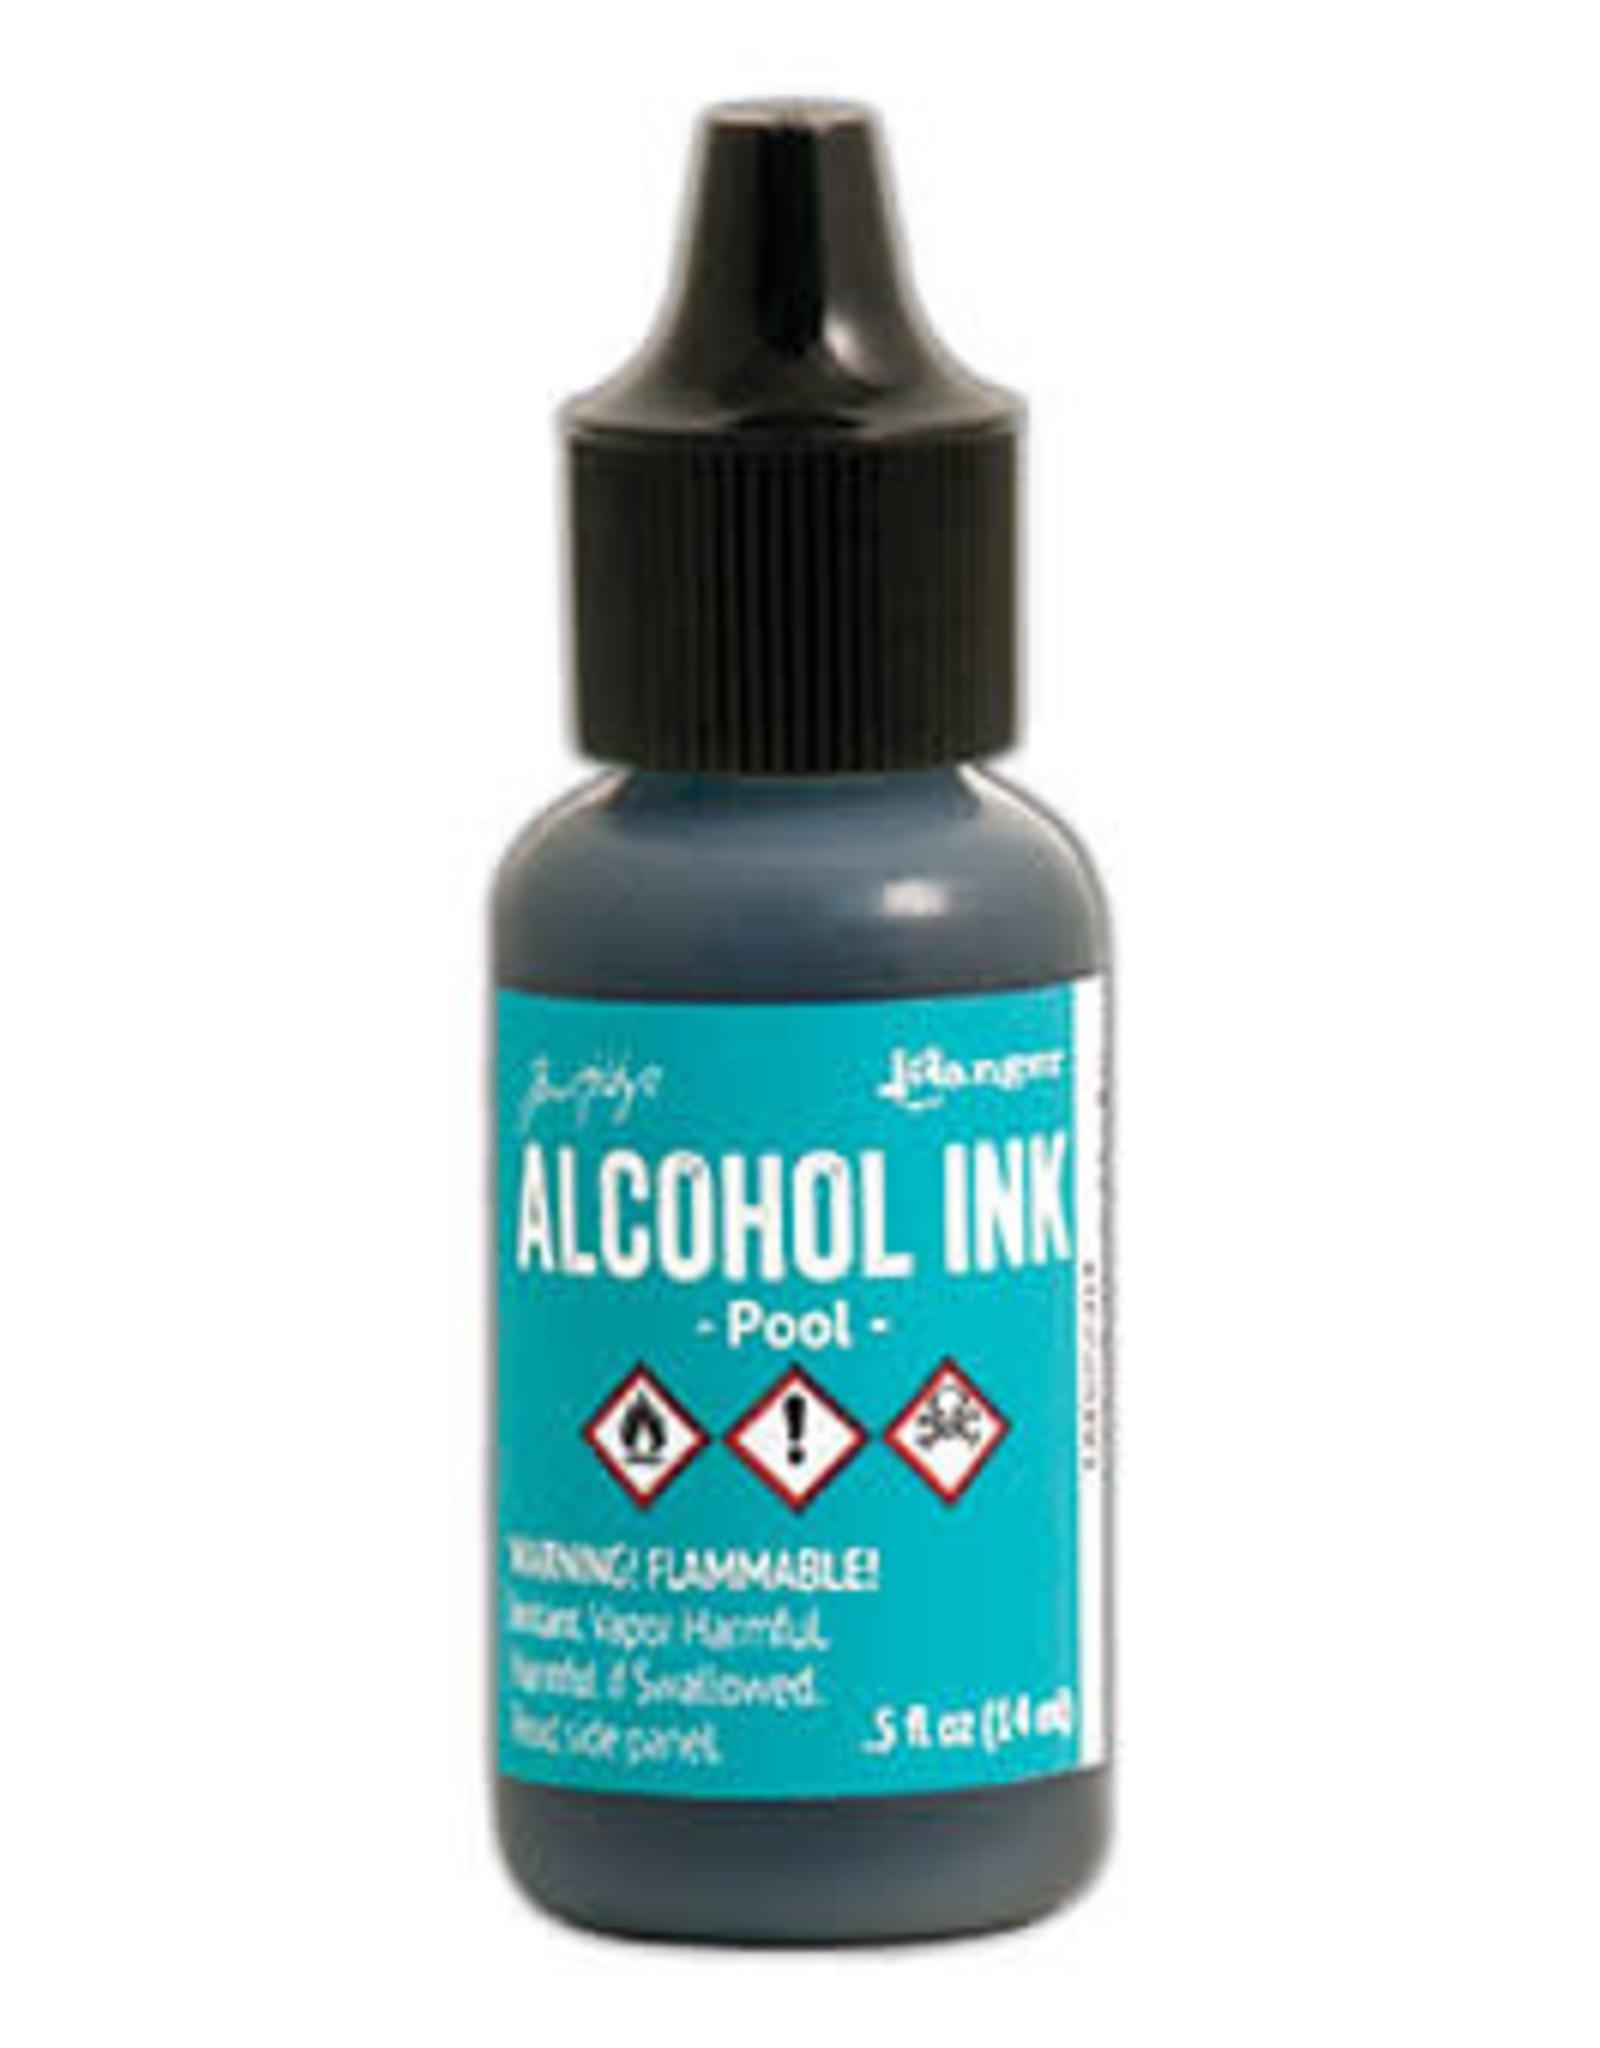 Tim Holtz Alcohol Ink 1/2 oz Pool